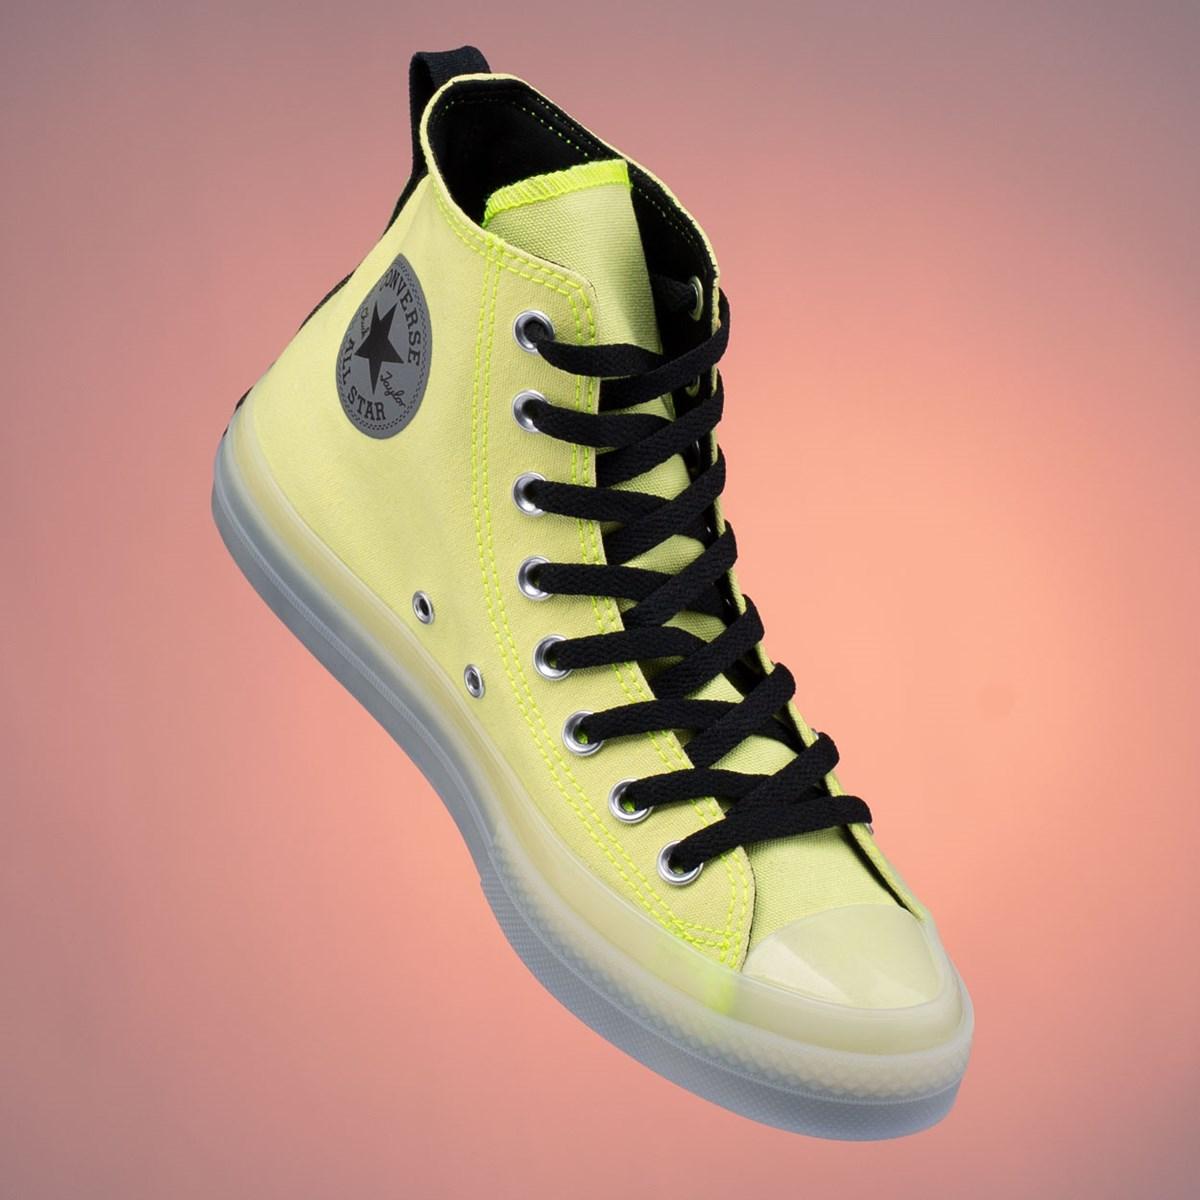 Tênis Converse Chuck Taylor All Star CX Hi VIS Lemon White Venom Black 169604C